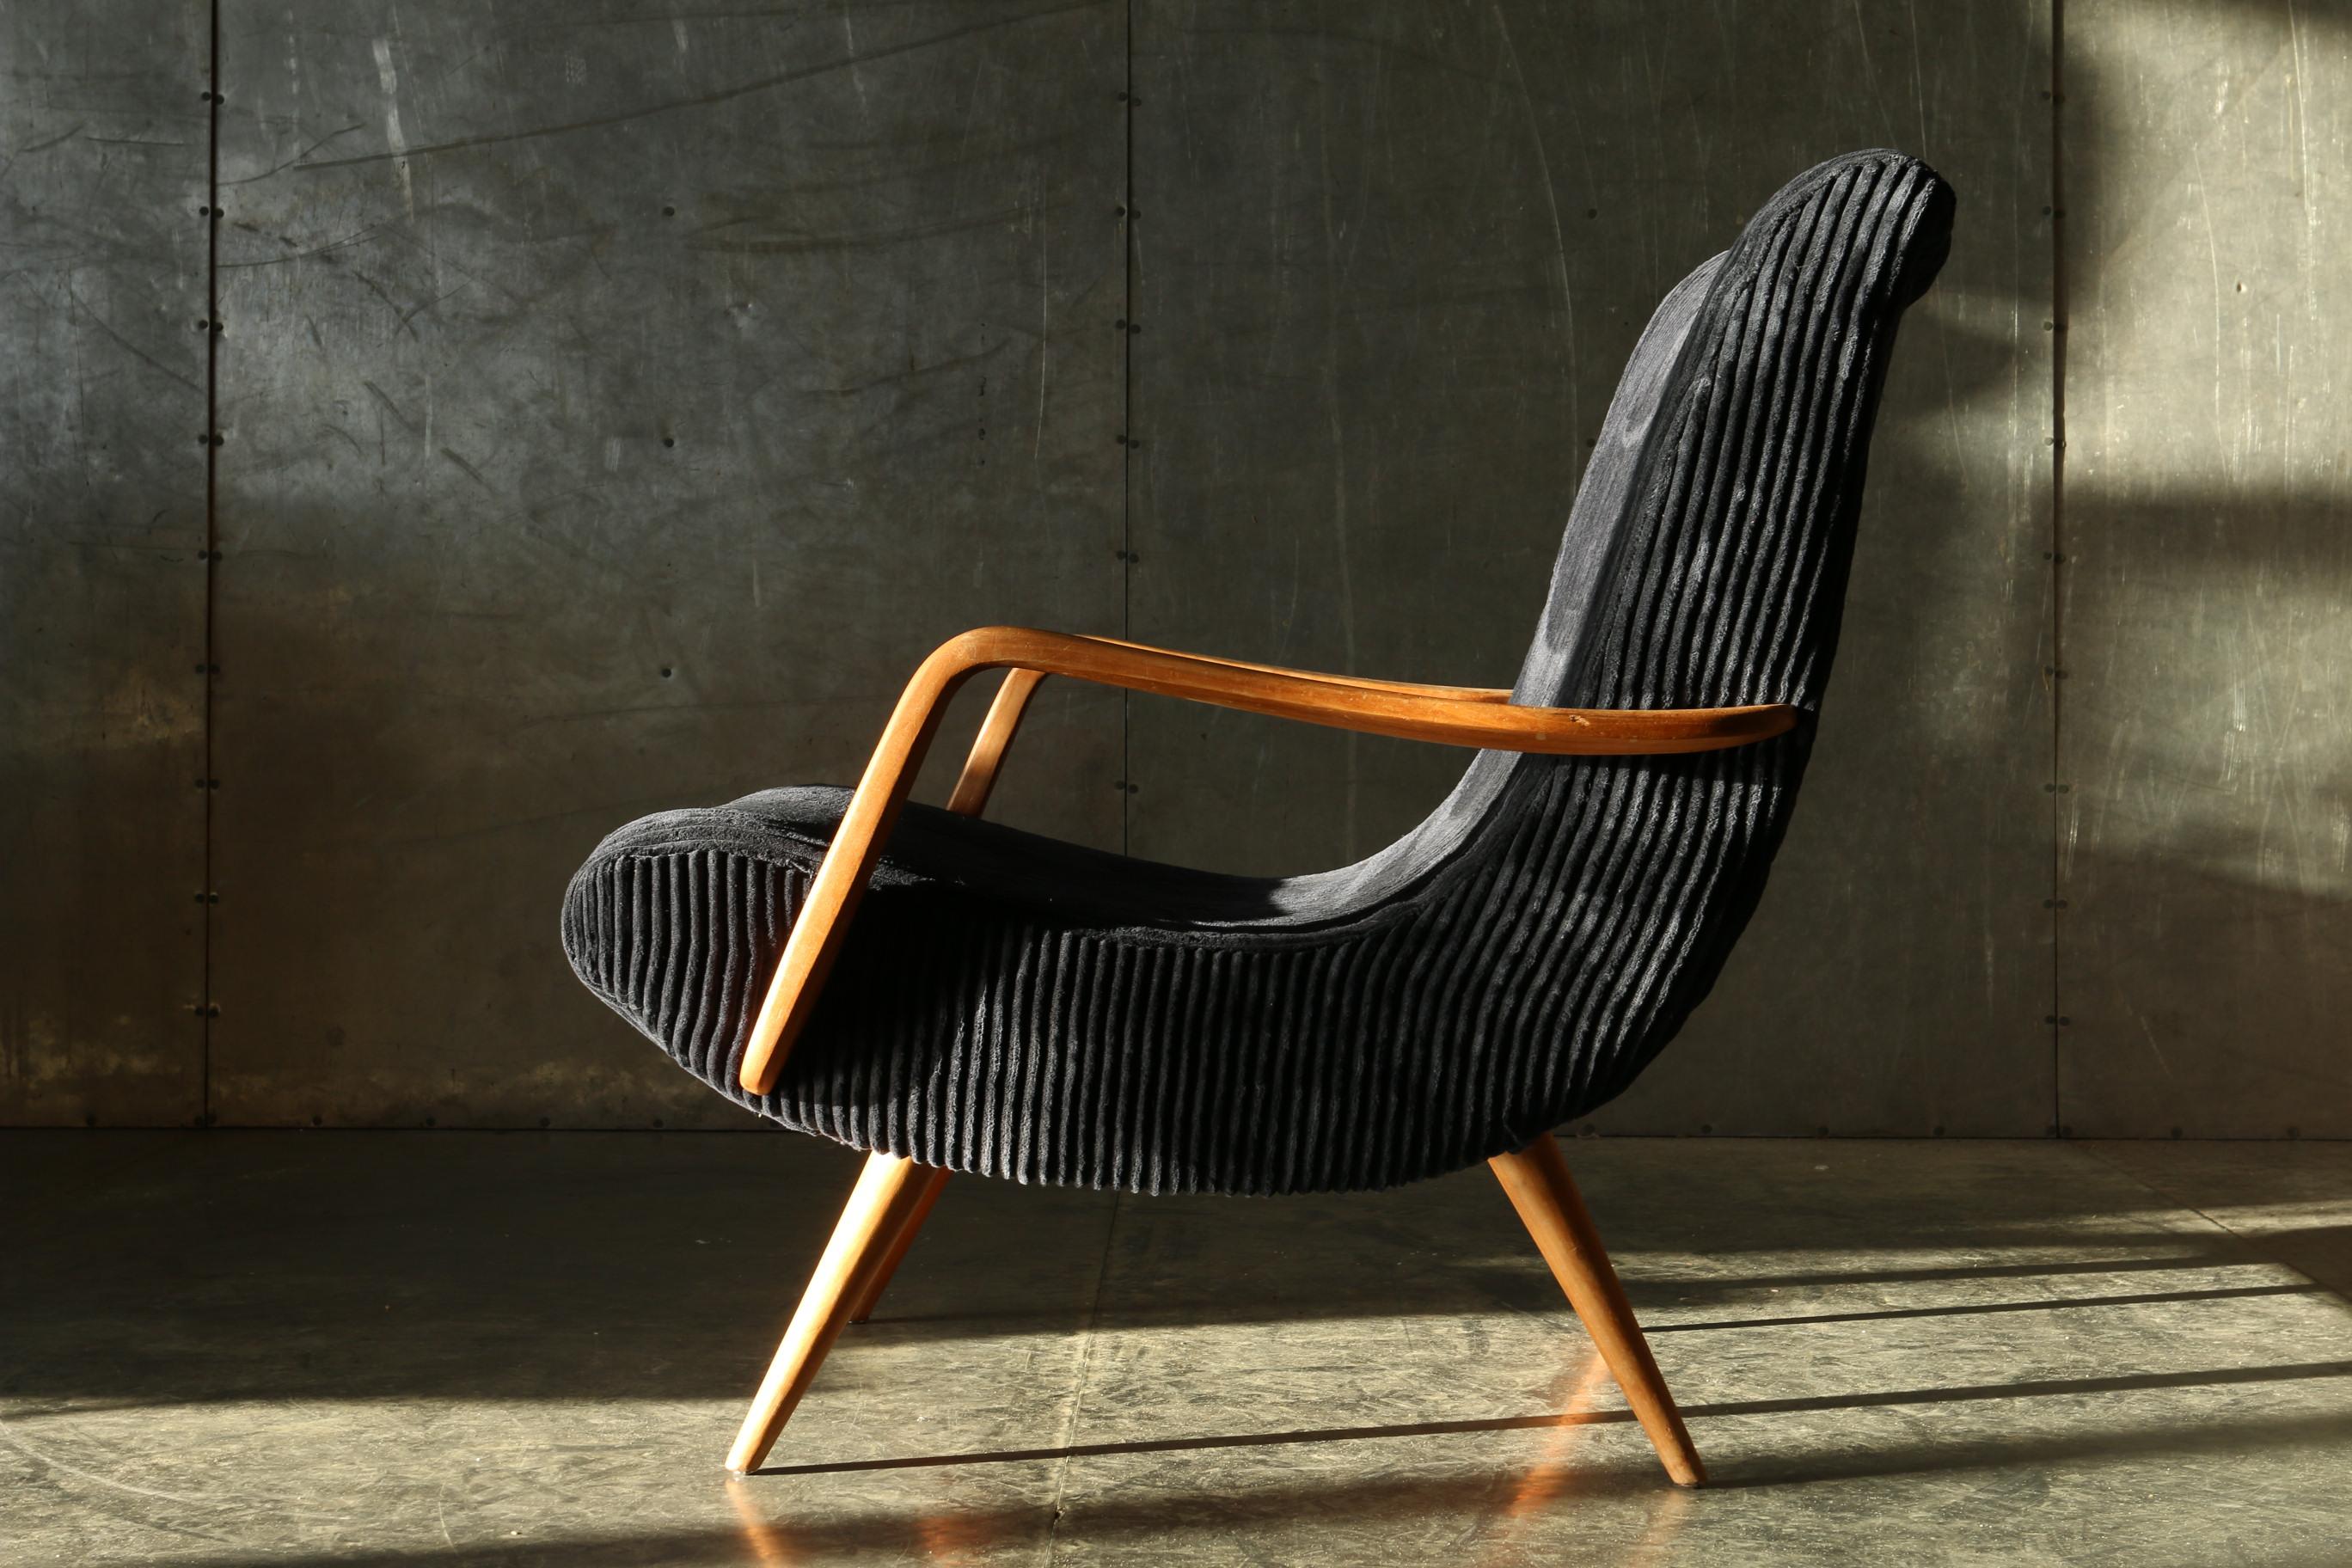 Vintage Design Fauteuil.Top Vintage Design Fauteuil Jaren 60 Dehuiszwaluw